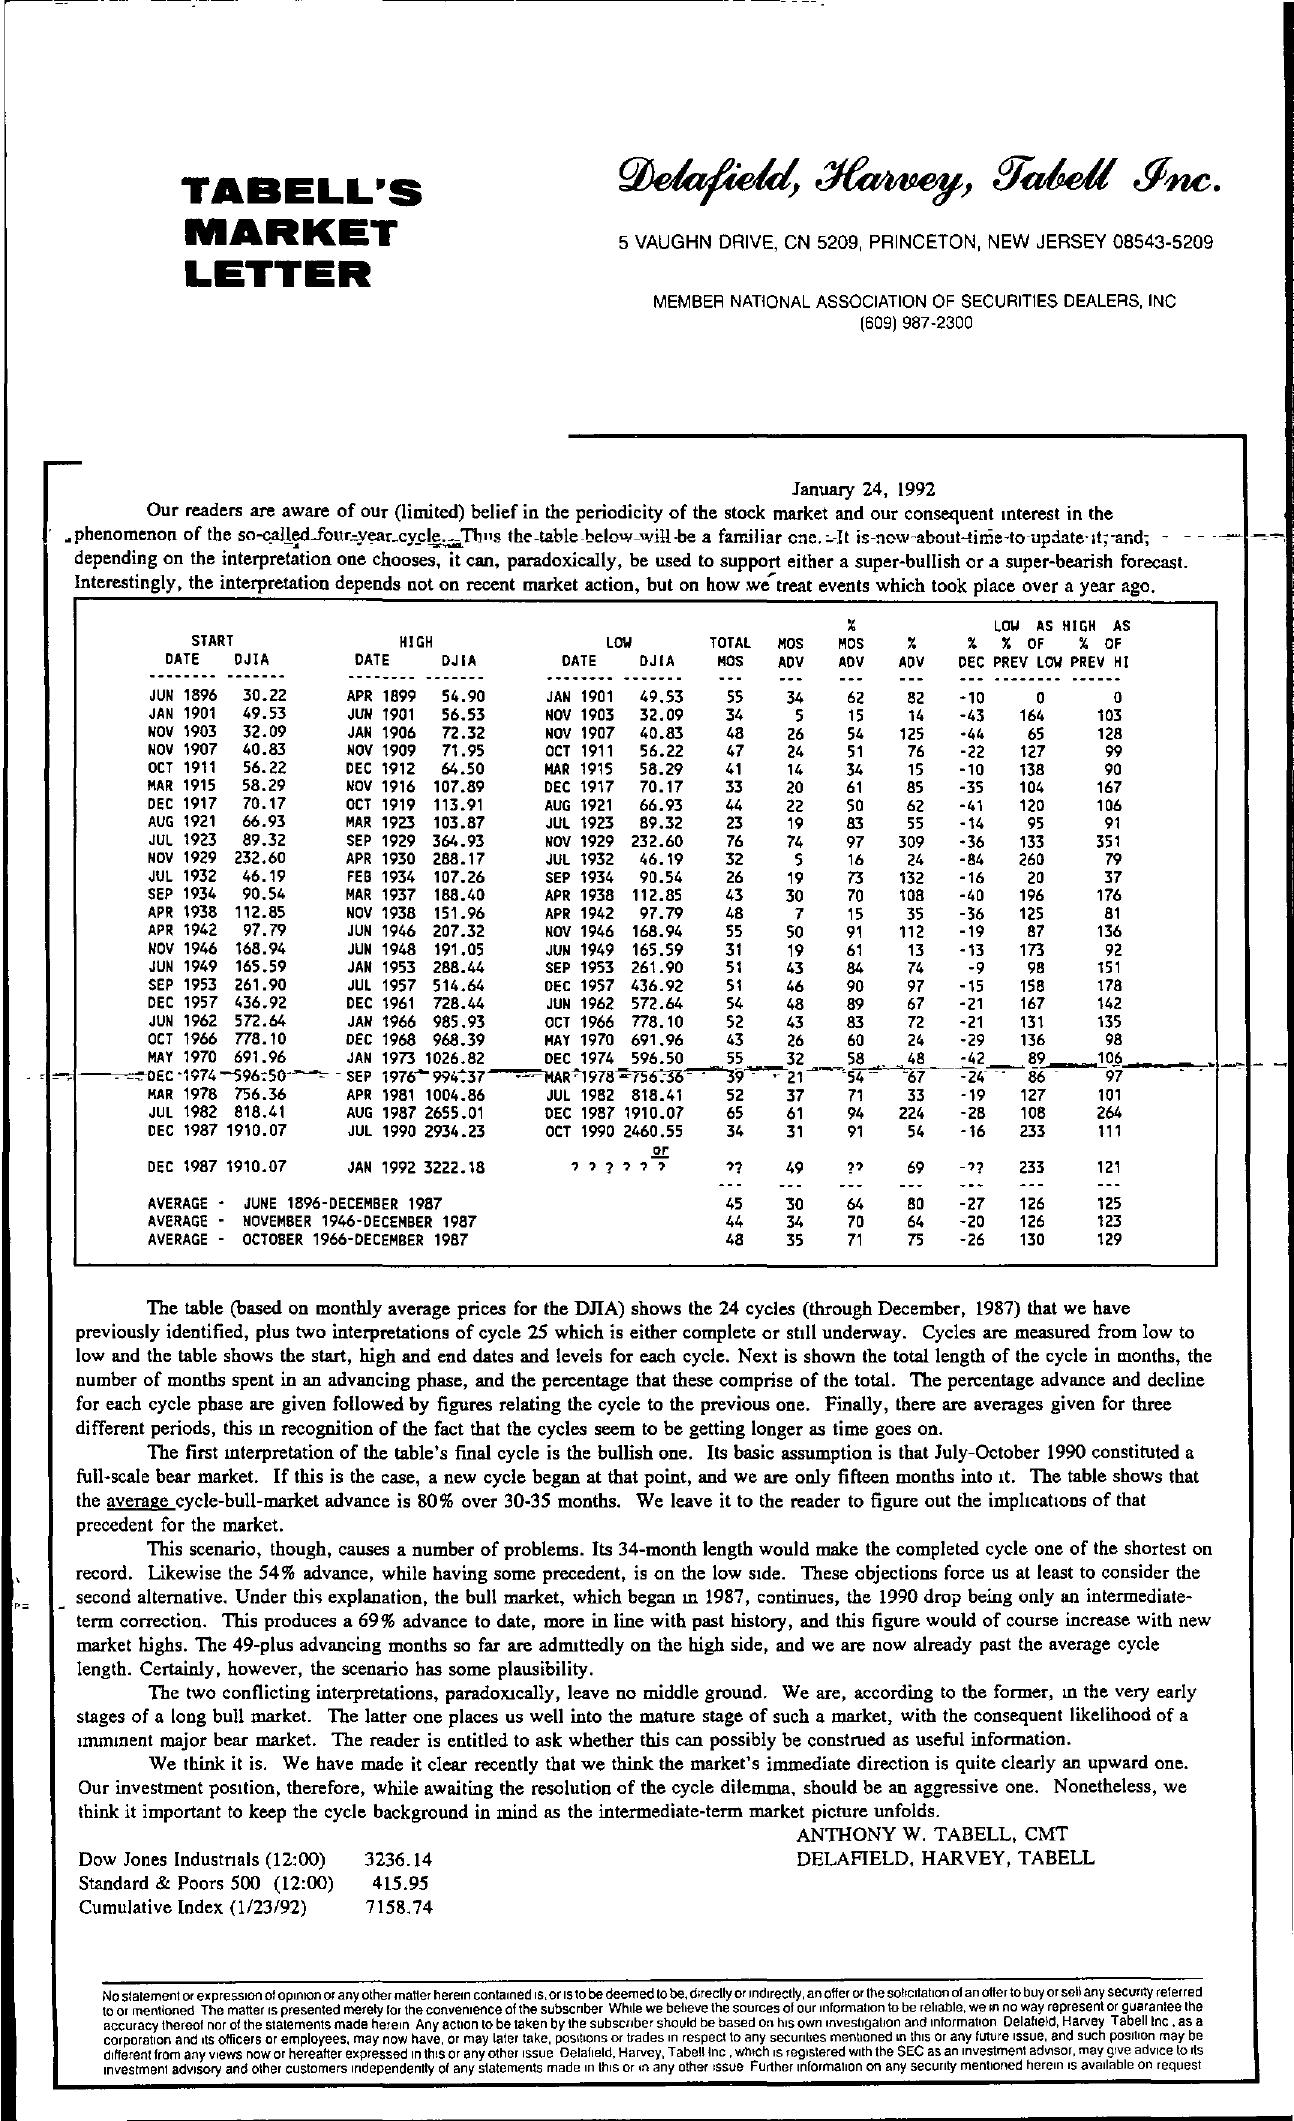 Tabell's Market Letter - January 24, 1992